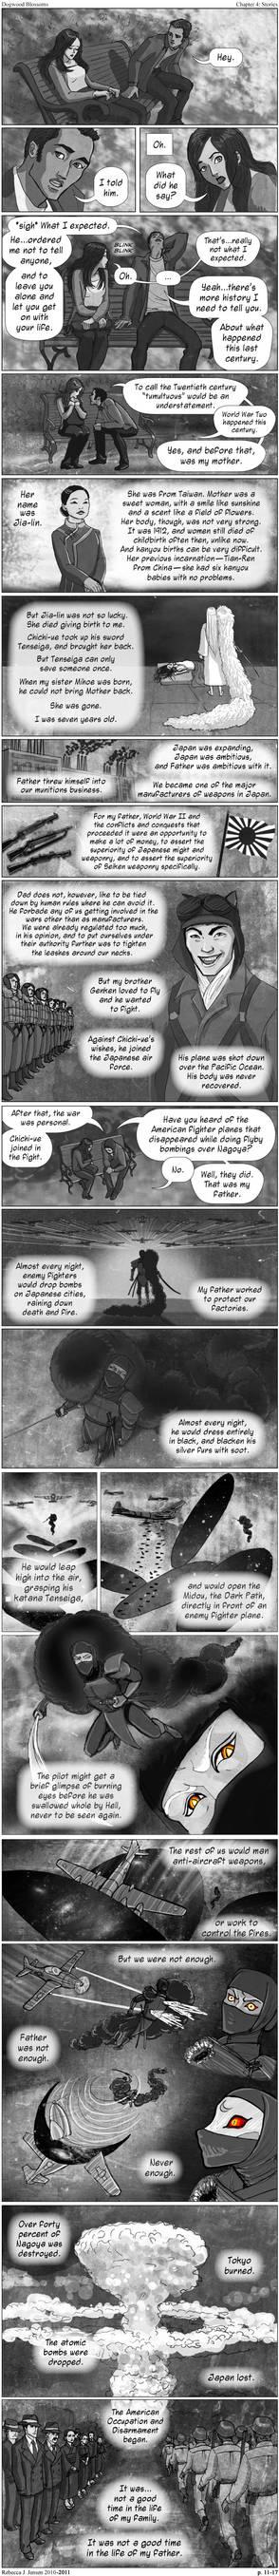 Dogwood Ch4: Stories, p11-17